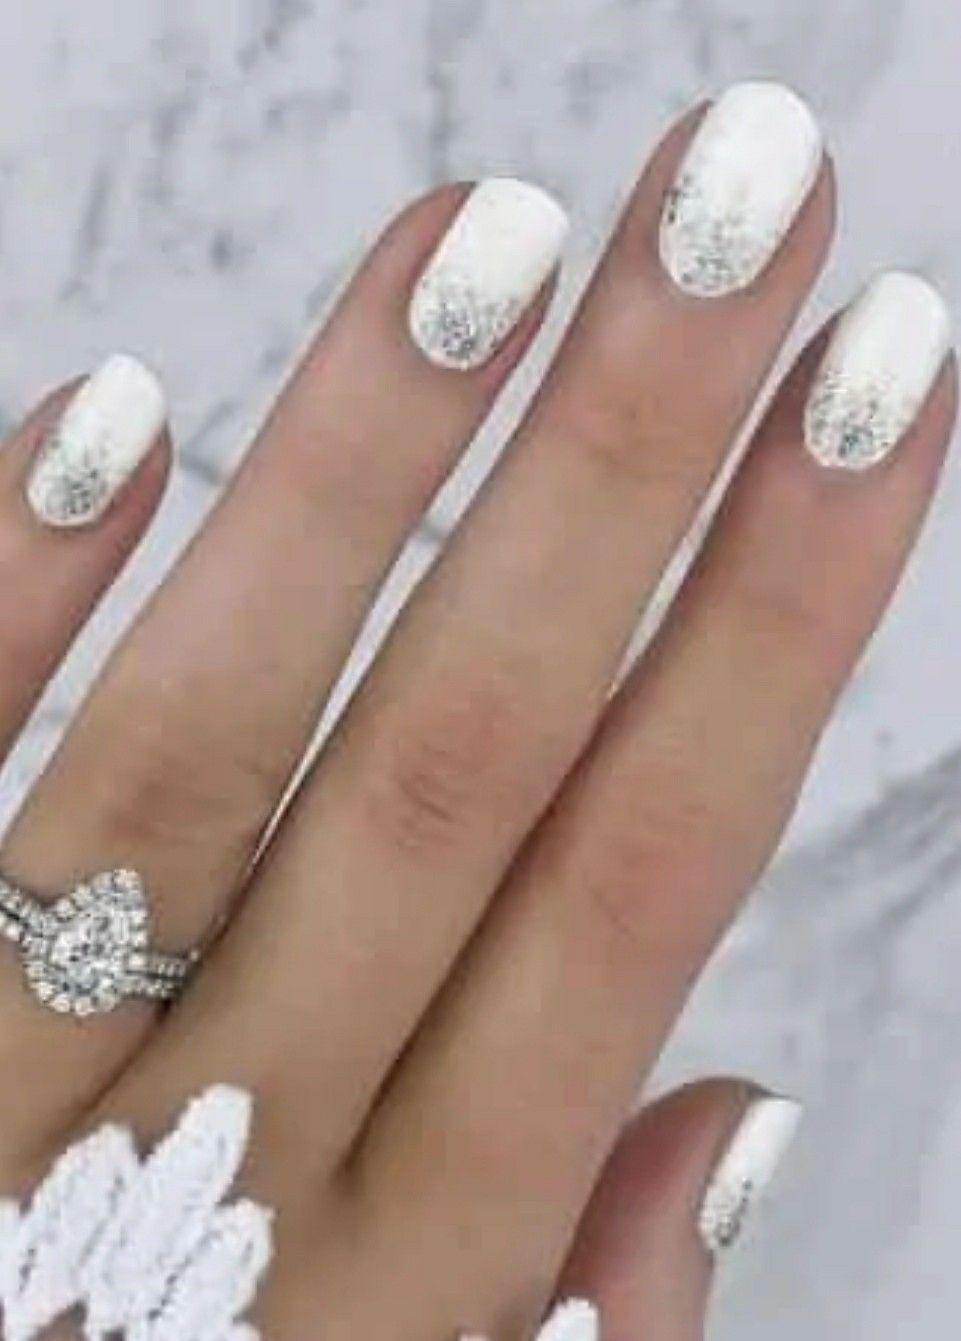 Manichiura simpla pentru unghii mici